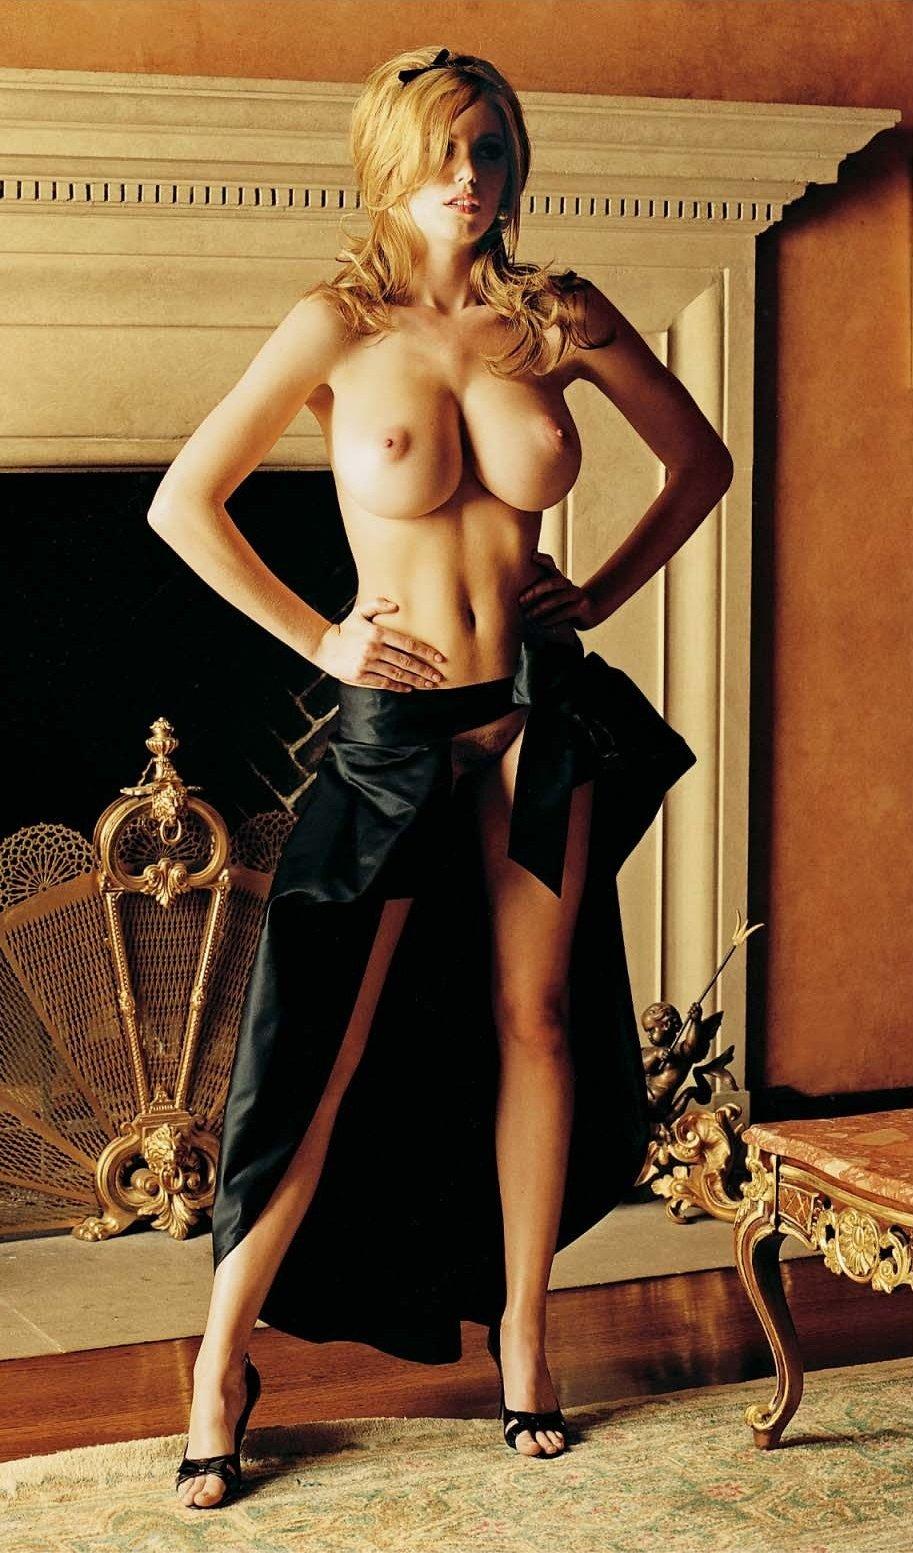 Diora baird topless